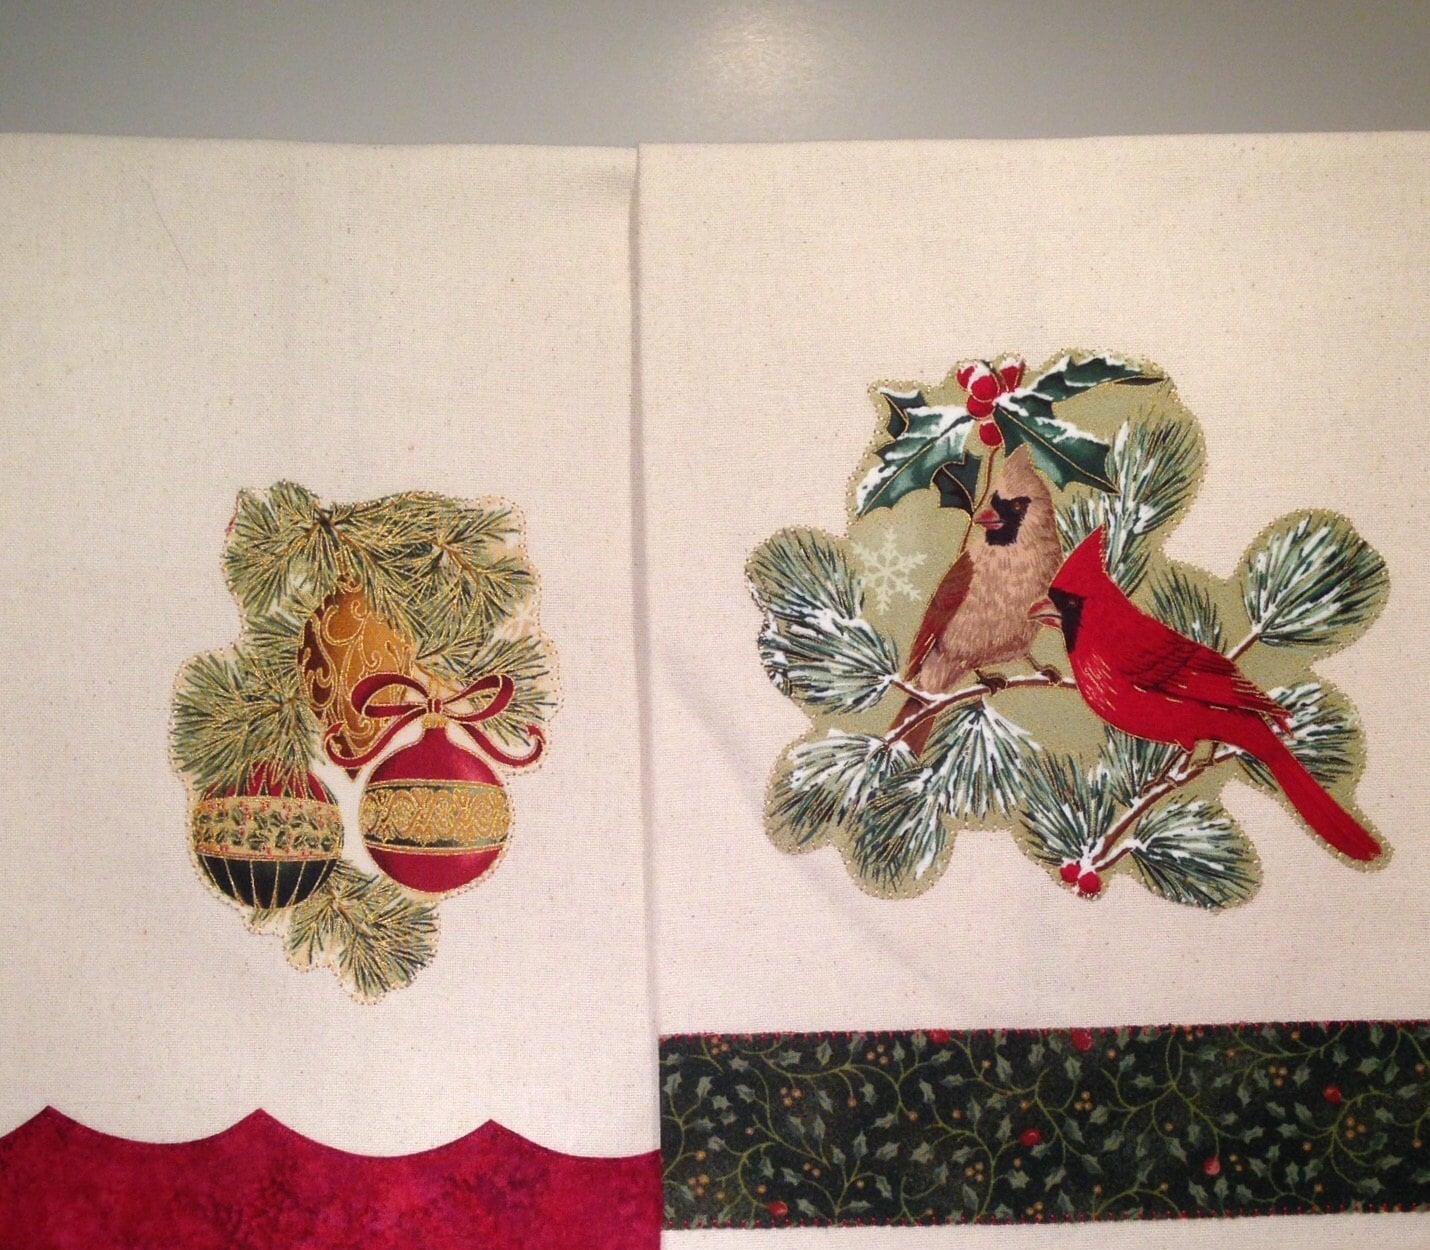 Christmas Holiday Kitchen Towels Dish Towels Tea Towels Set